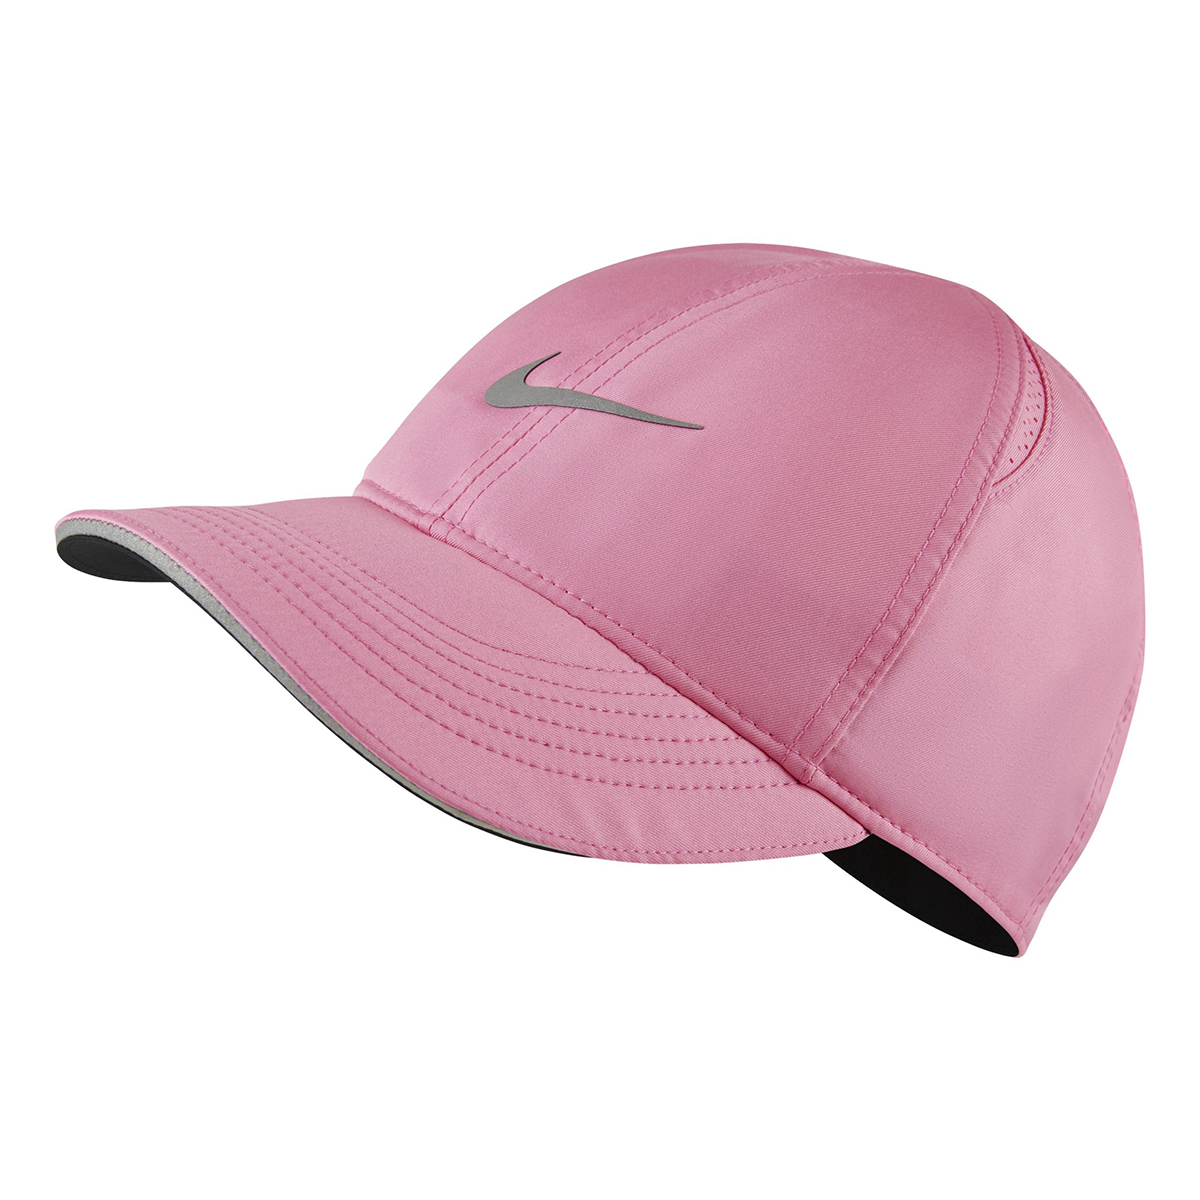 Women's Nike Featherlight Run Cap - Color: Pink Glow - Size: OS, Pink Glow, large, image 1